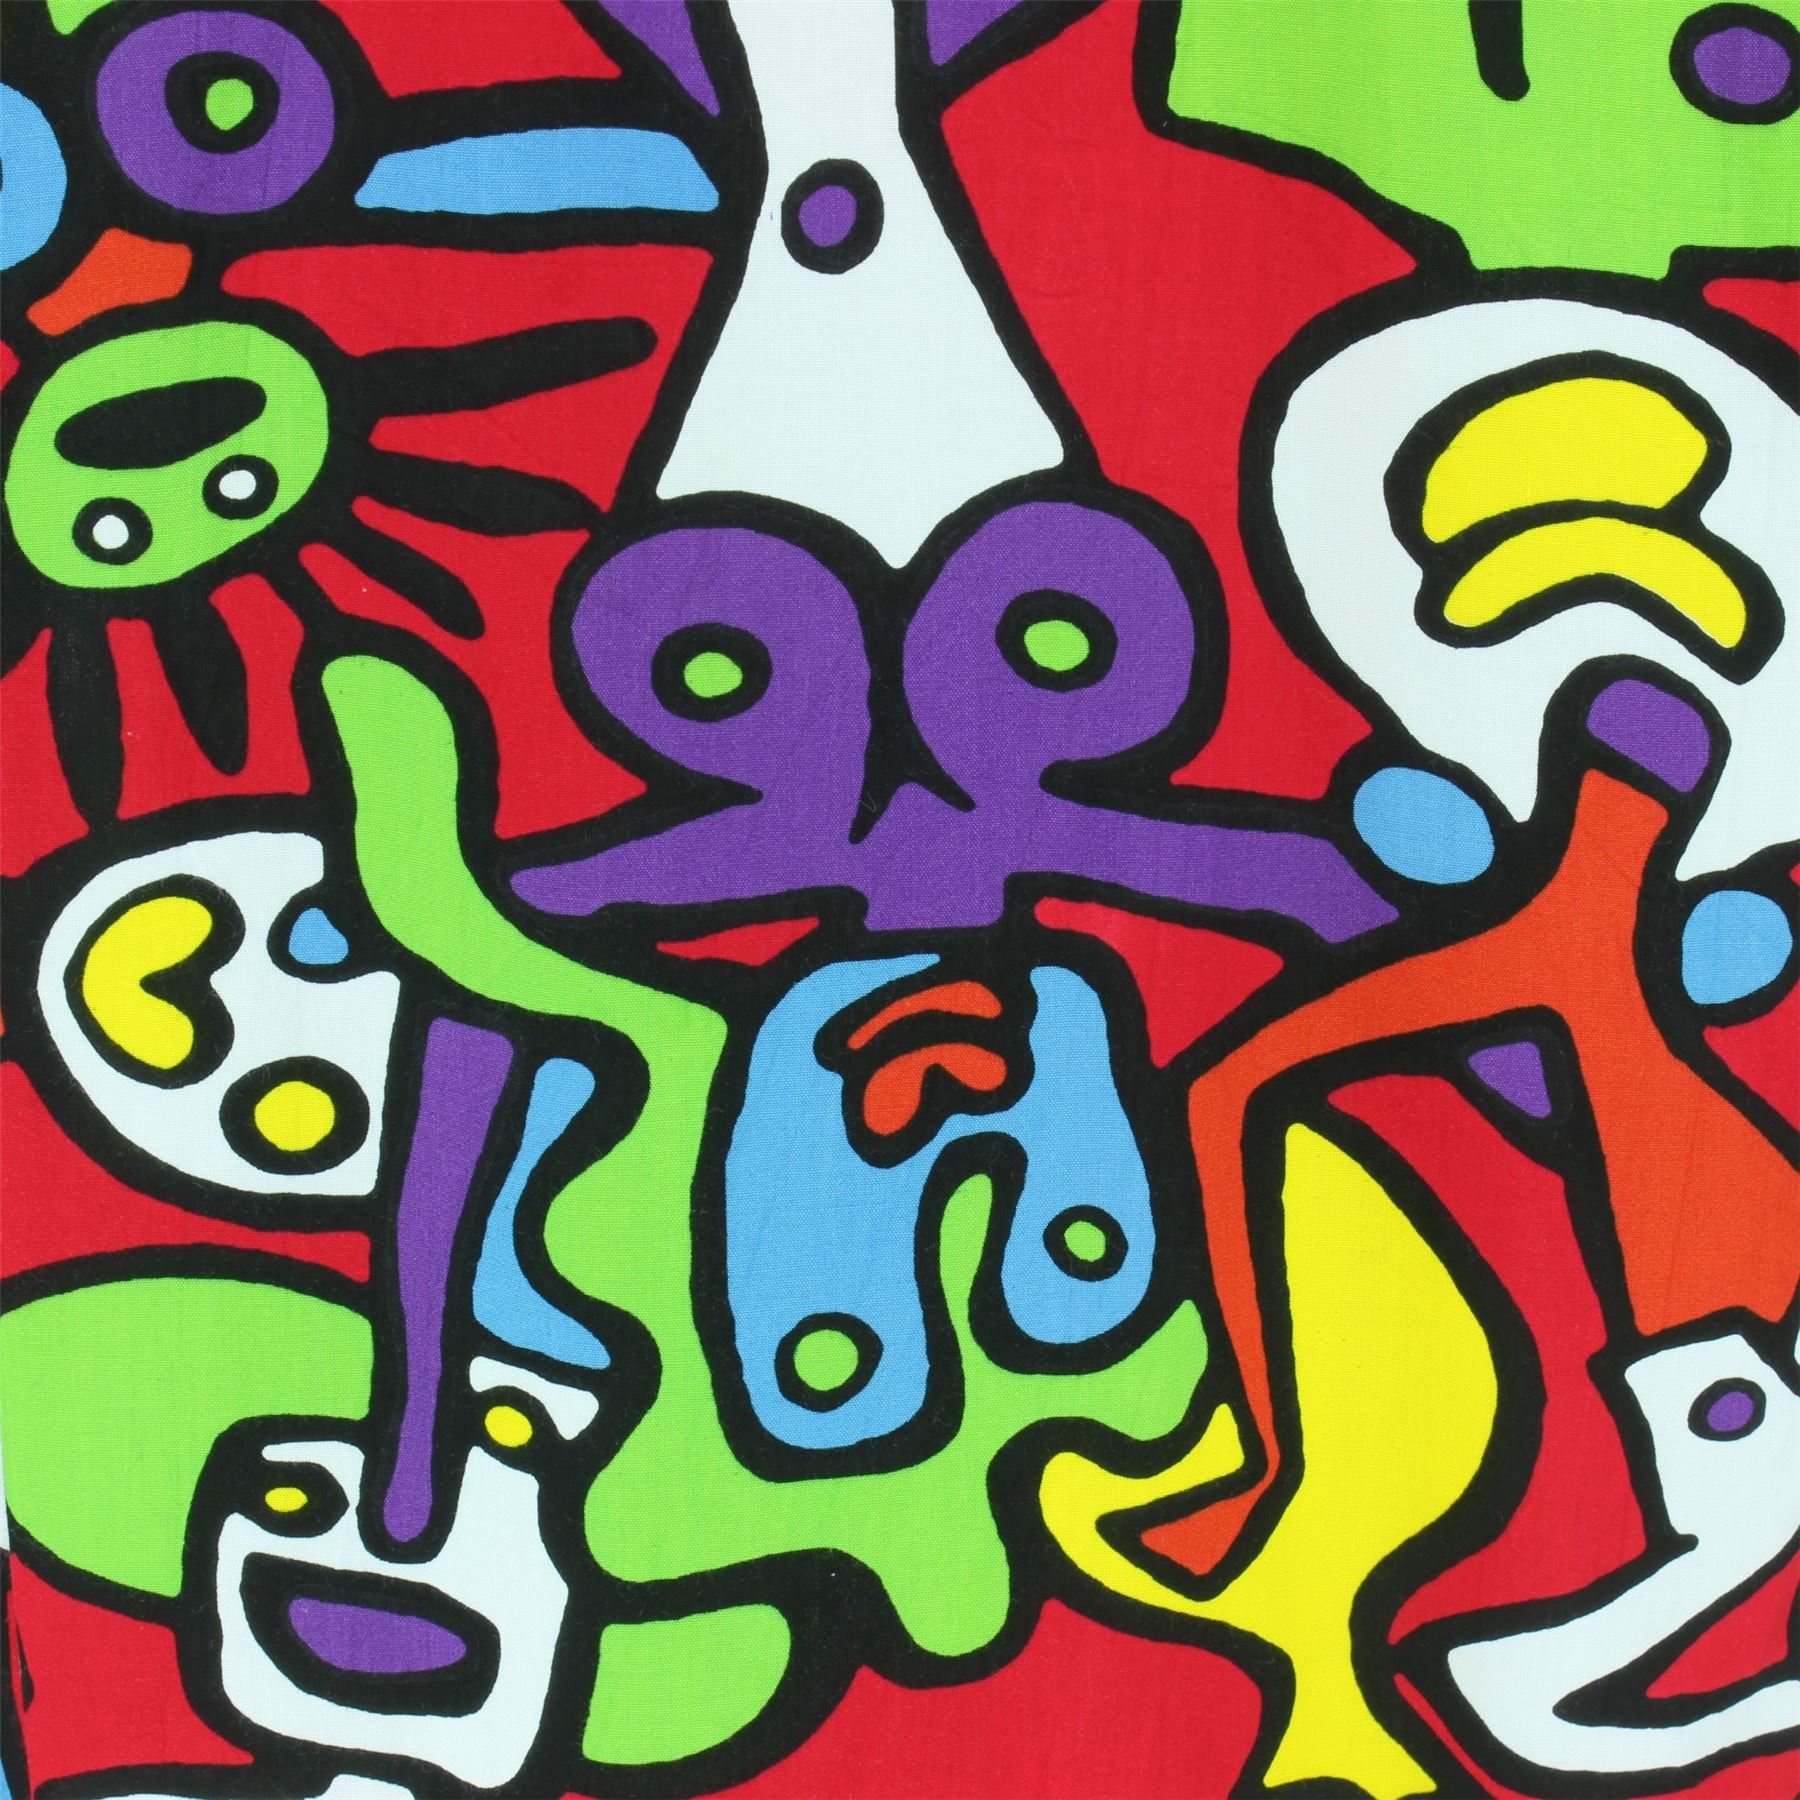 Mens-Shirt-Loud-Originals-Rayon-REGULAR-FIT-Long-Sleeve-TIFFY-PRINT-Retro-Dance thumbnail 17